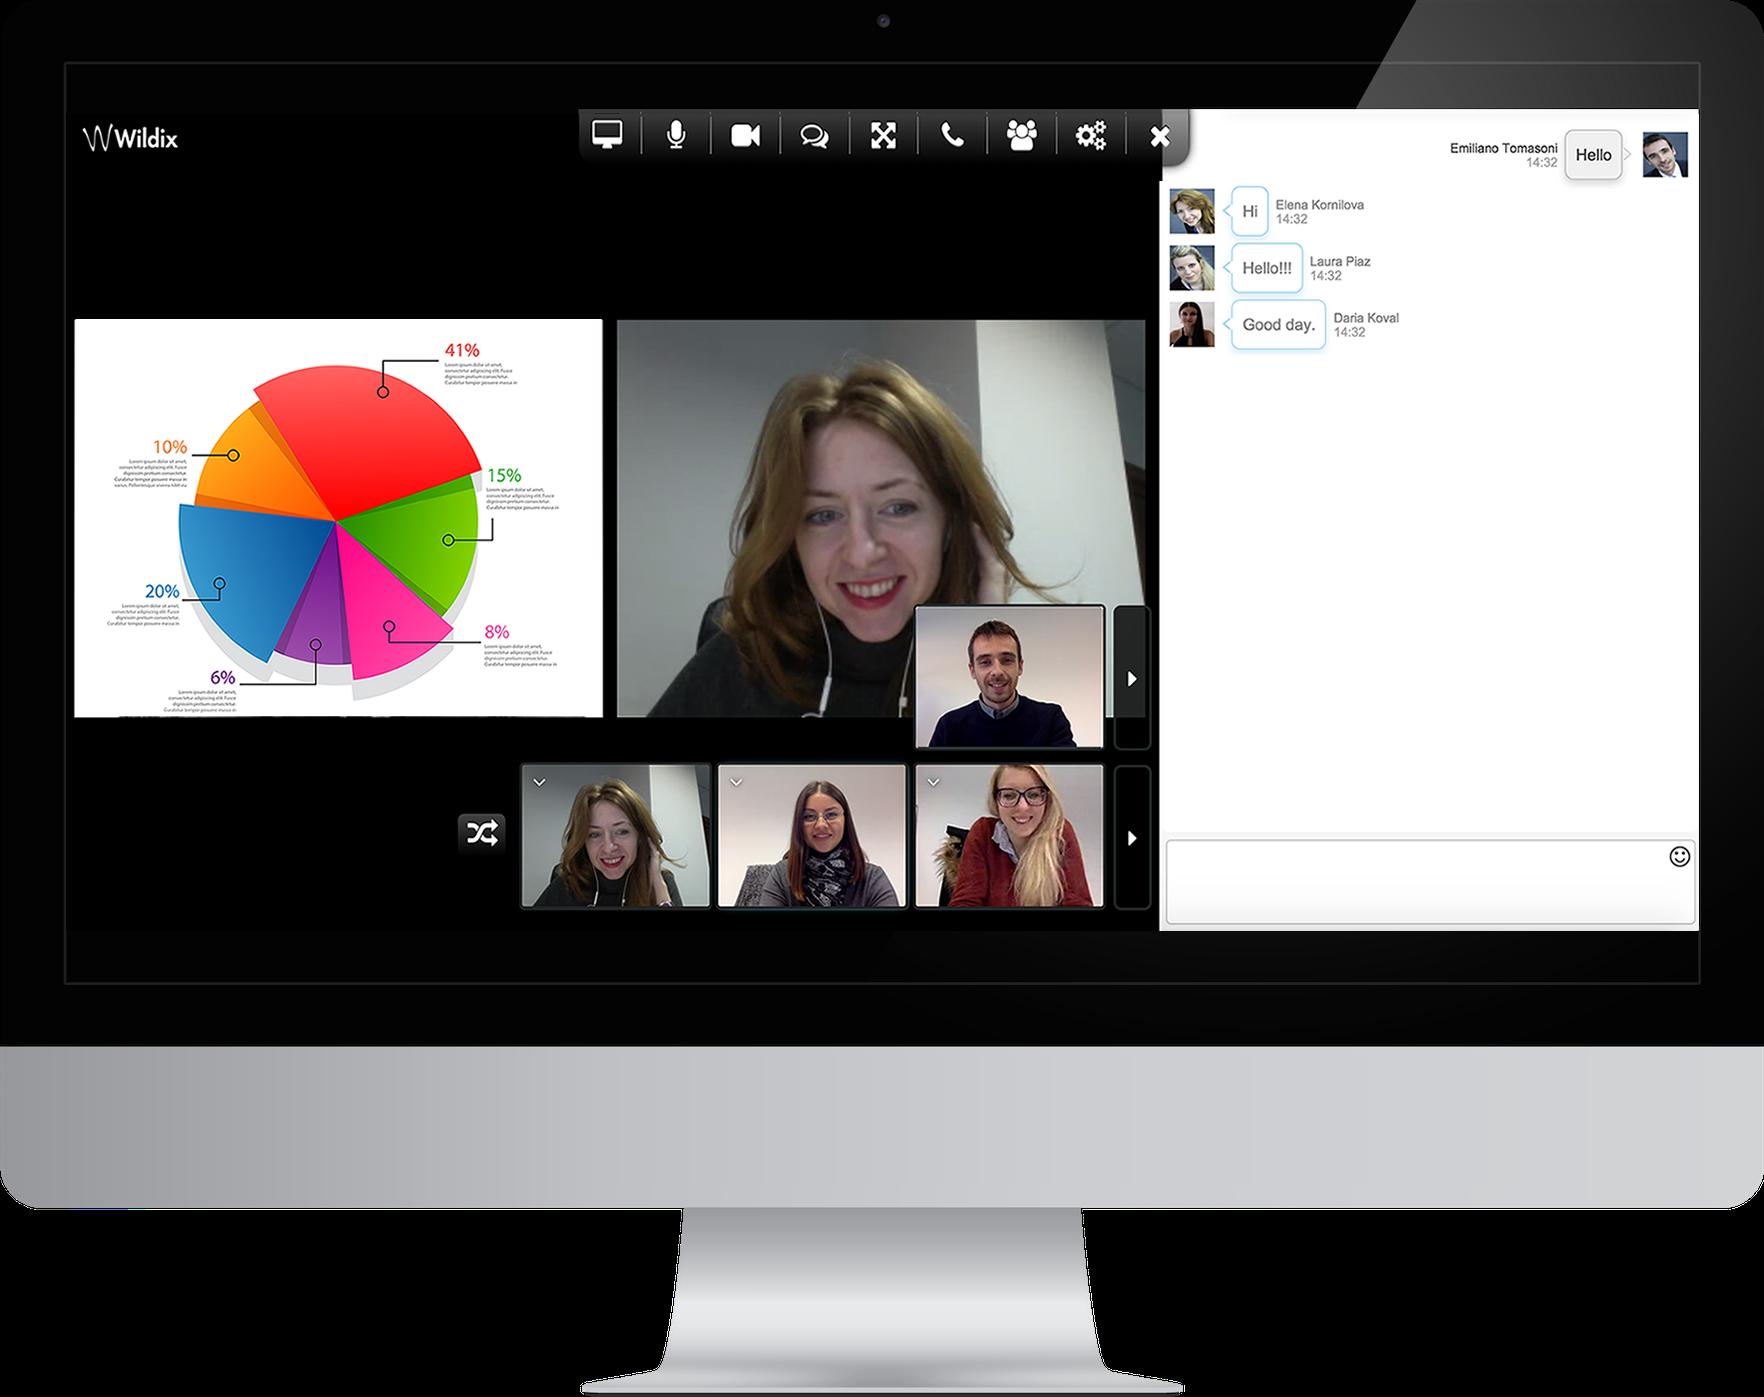 wildix-videoconference